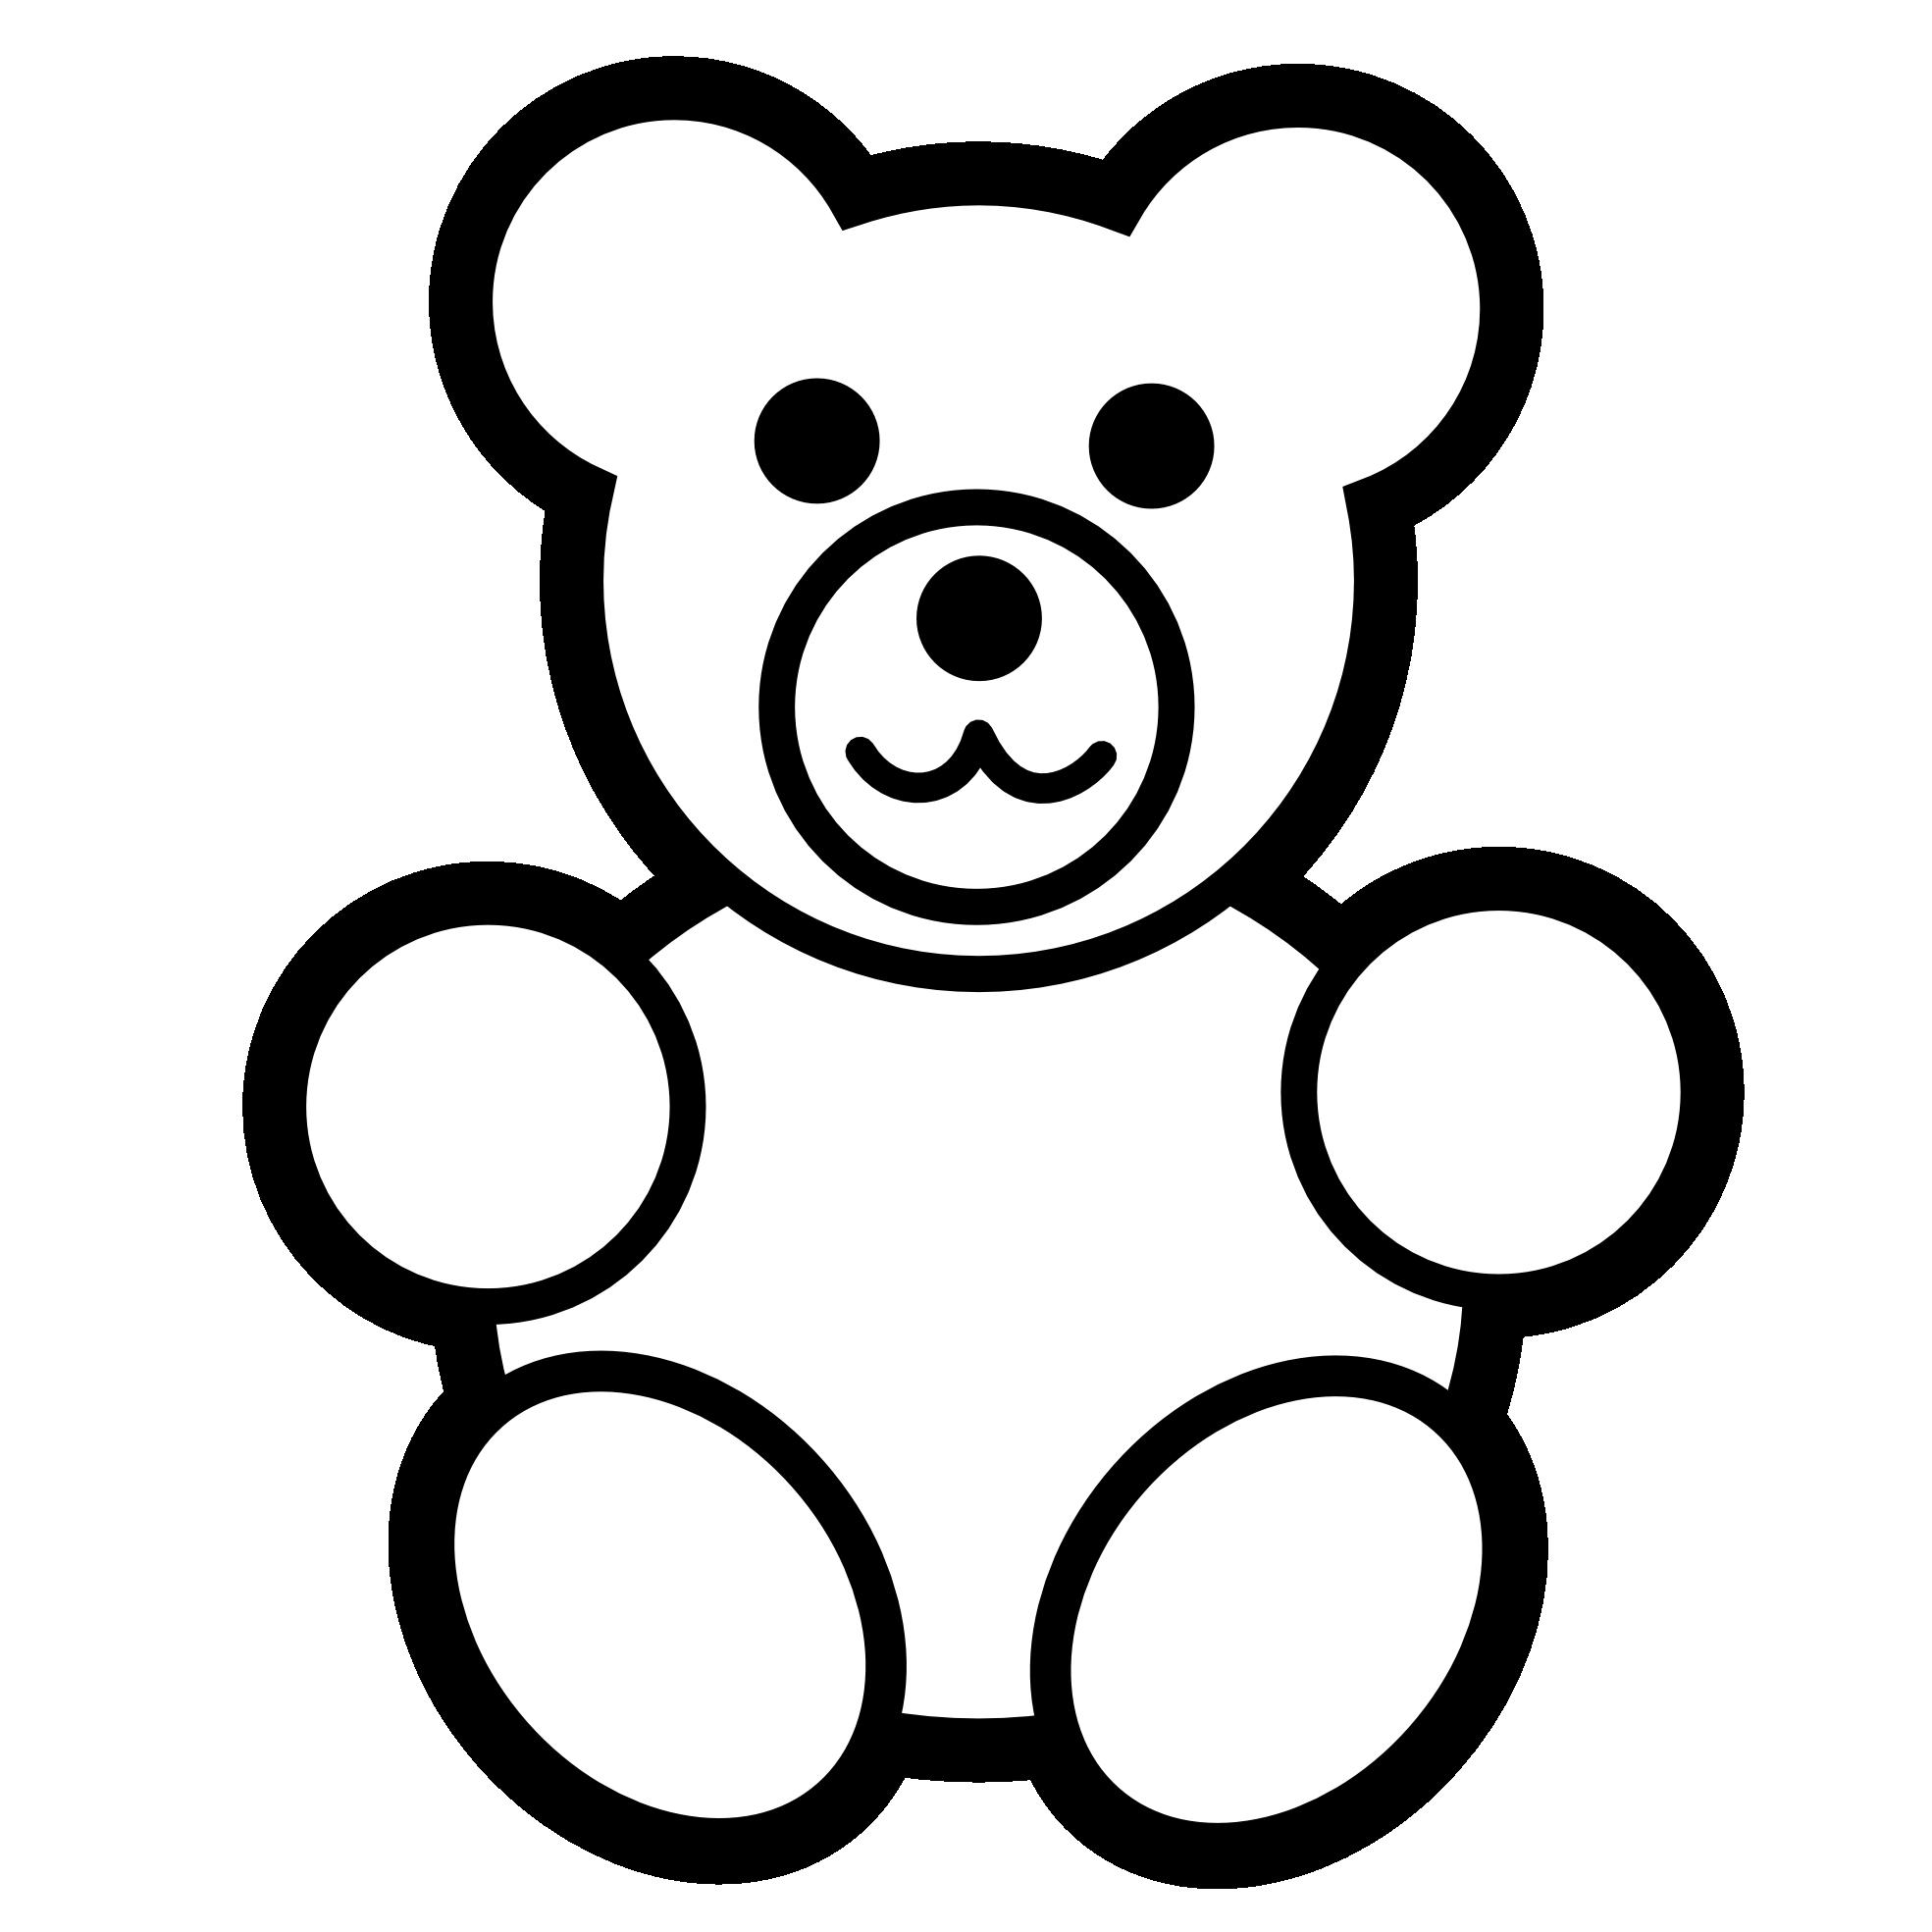 1969x1969 Plush Drawing Teddy Bear Frames Illustrations Hd Images